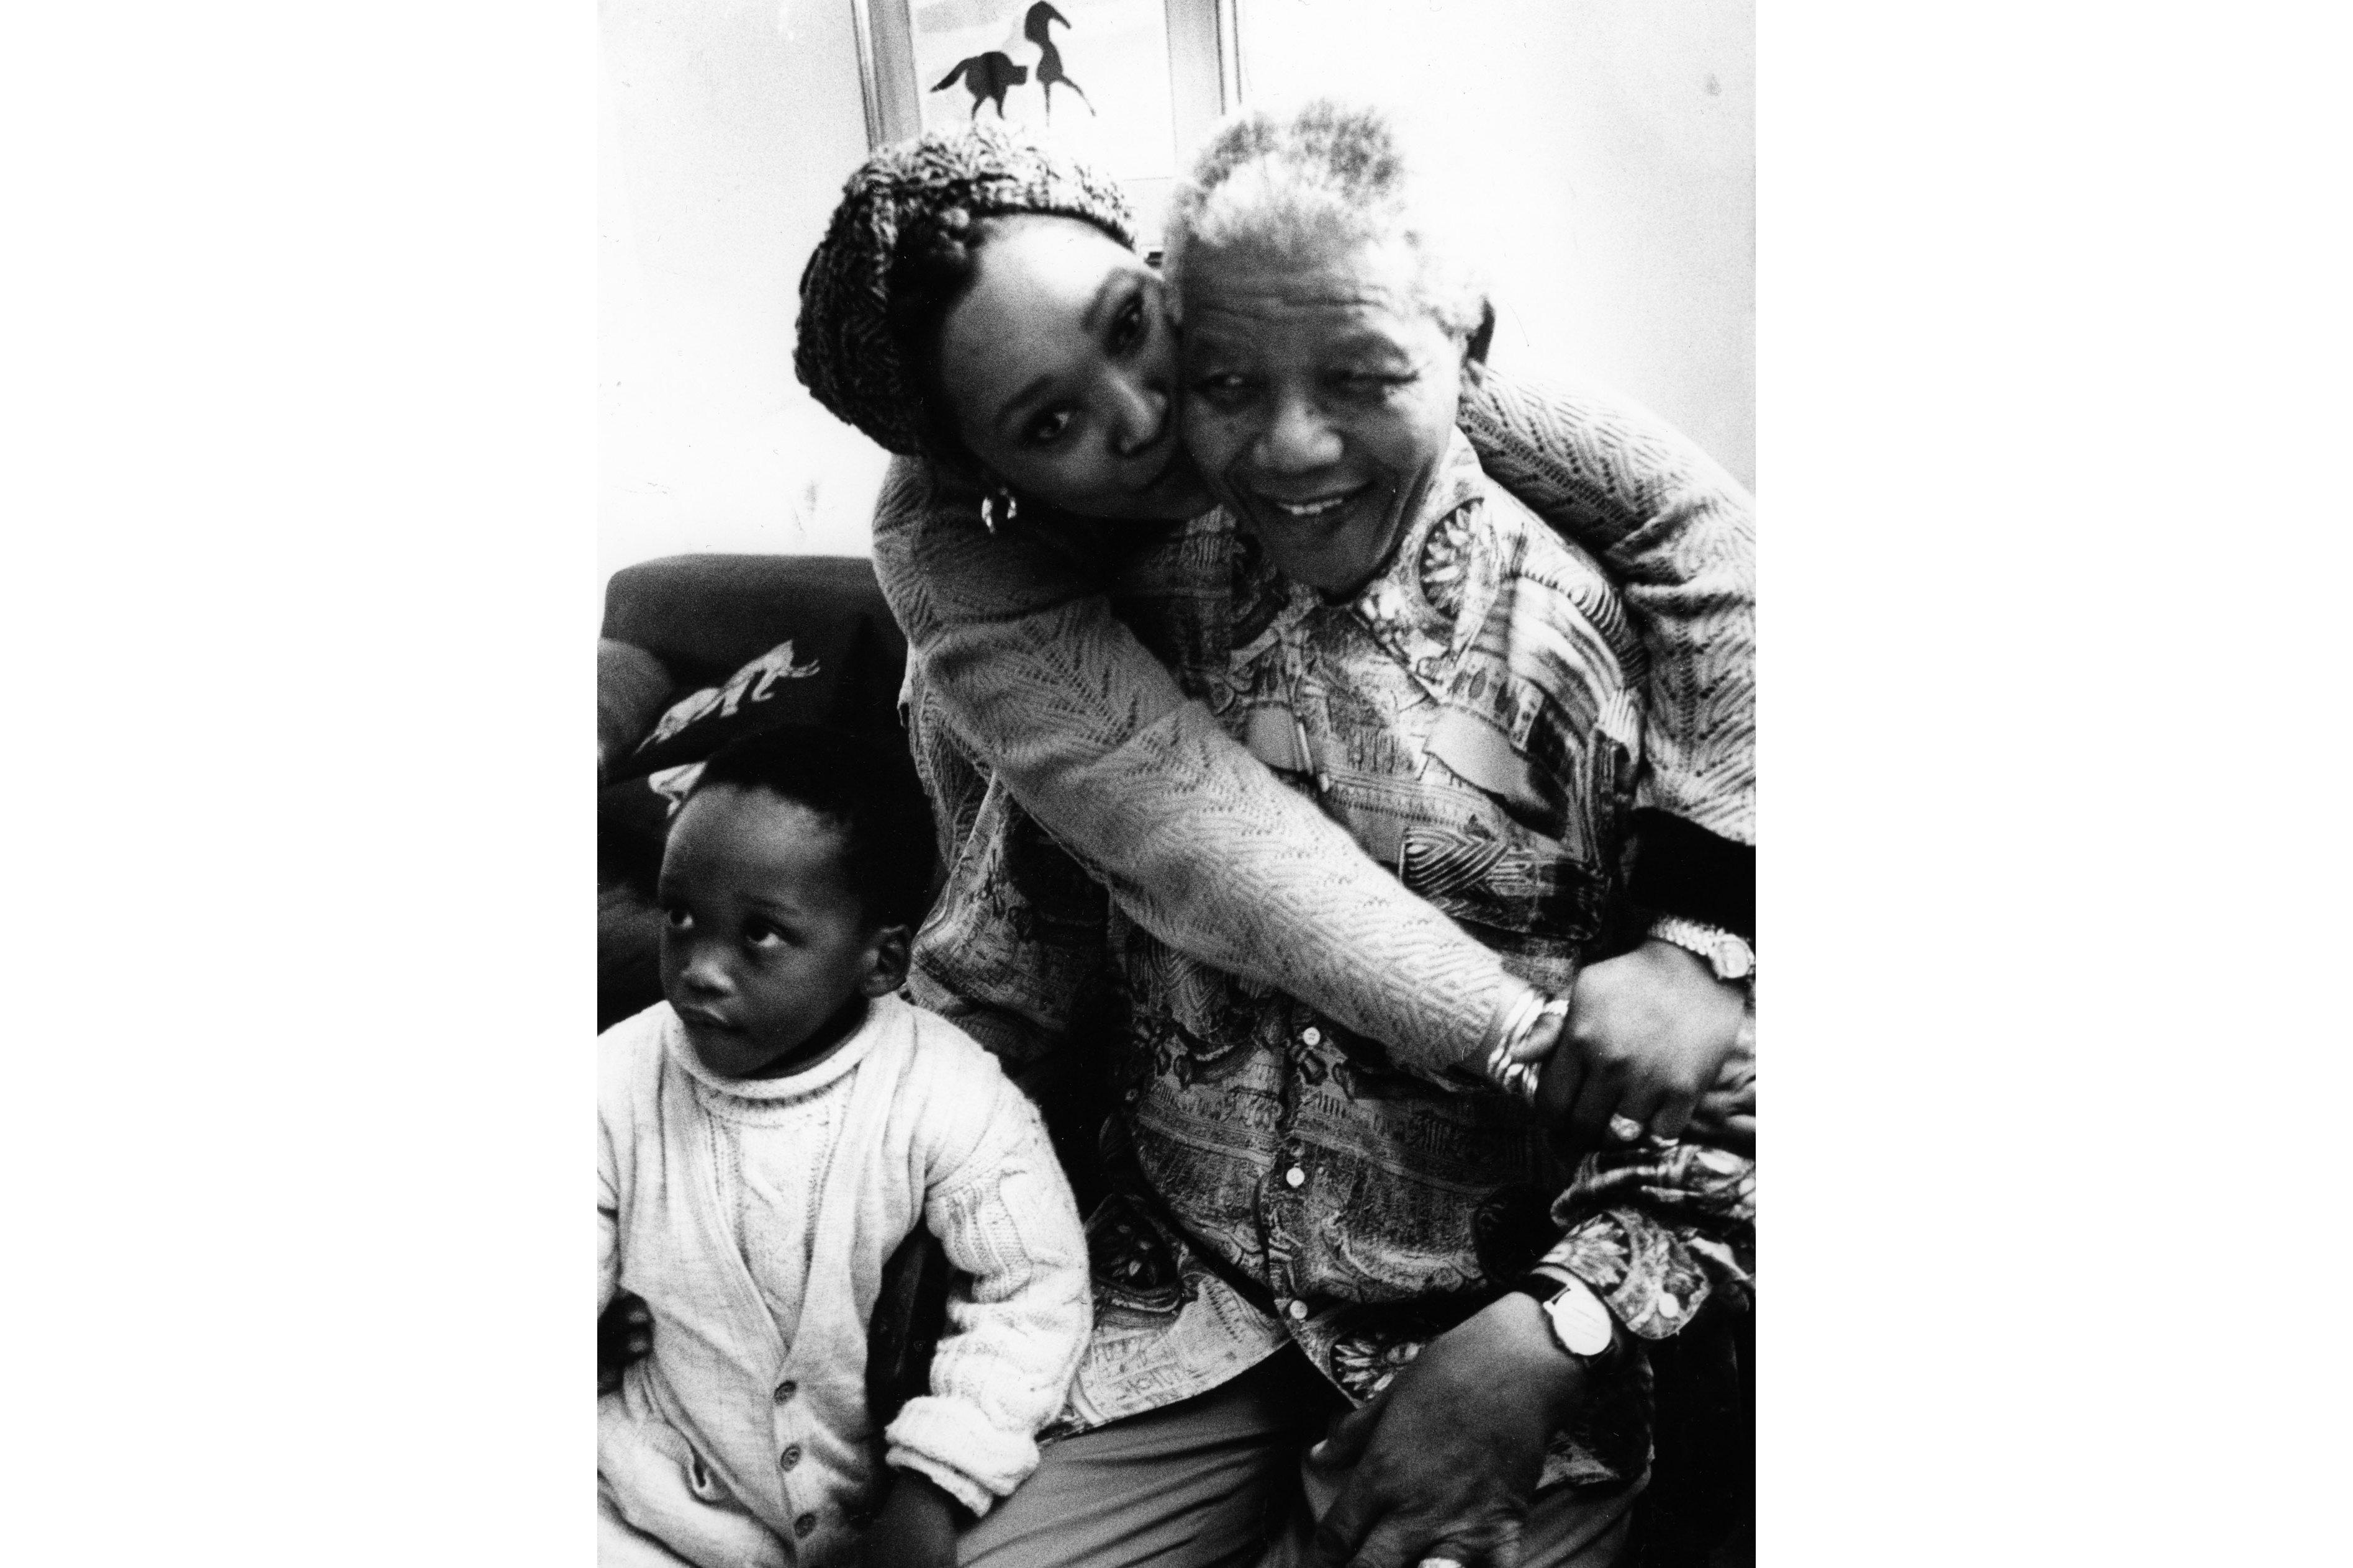 Zindzi-Mandela-Obituary-Full-Frame.jpg